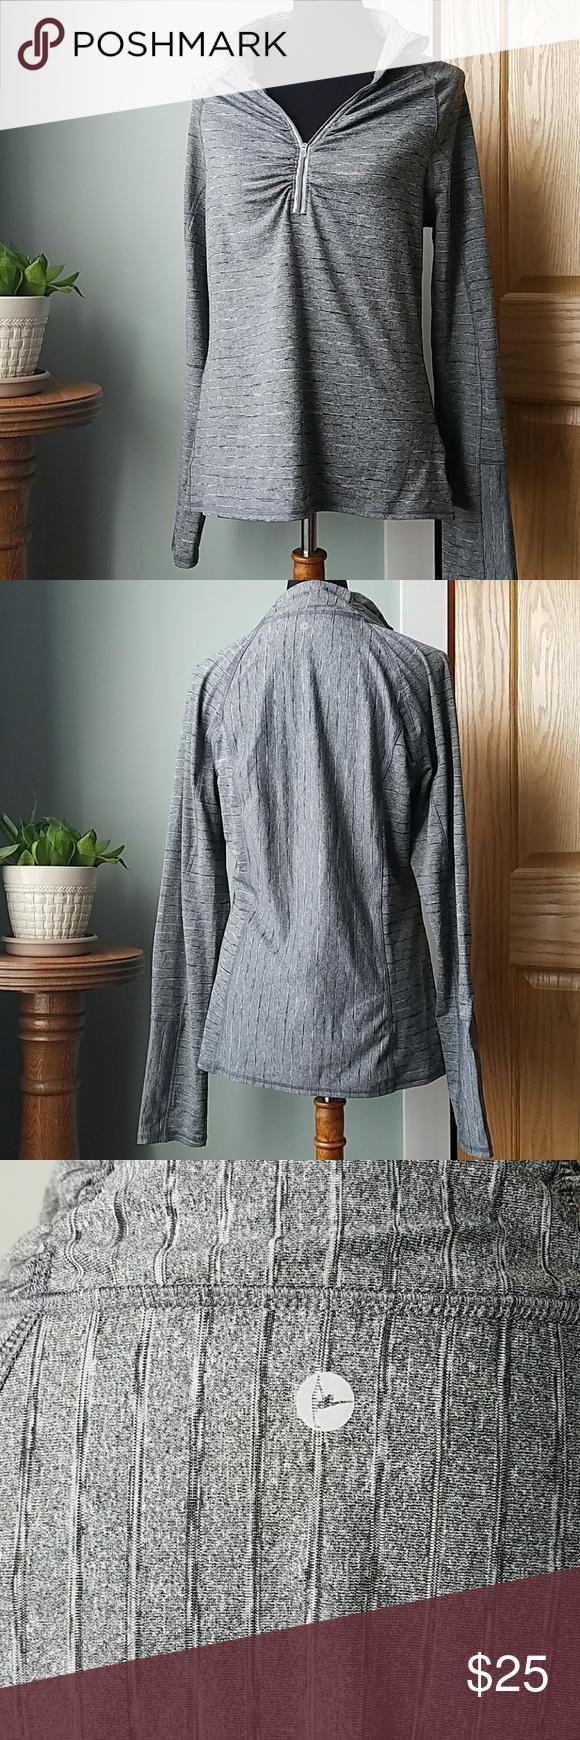 90 Degree Pullover 90 Degree running pullover, size XL